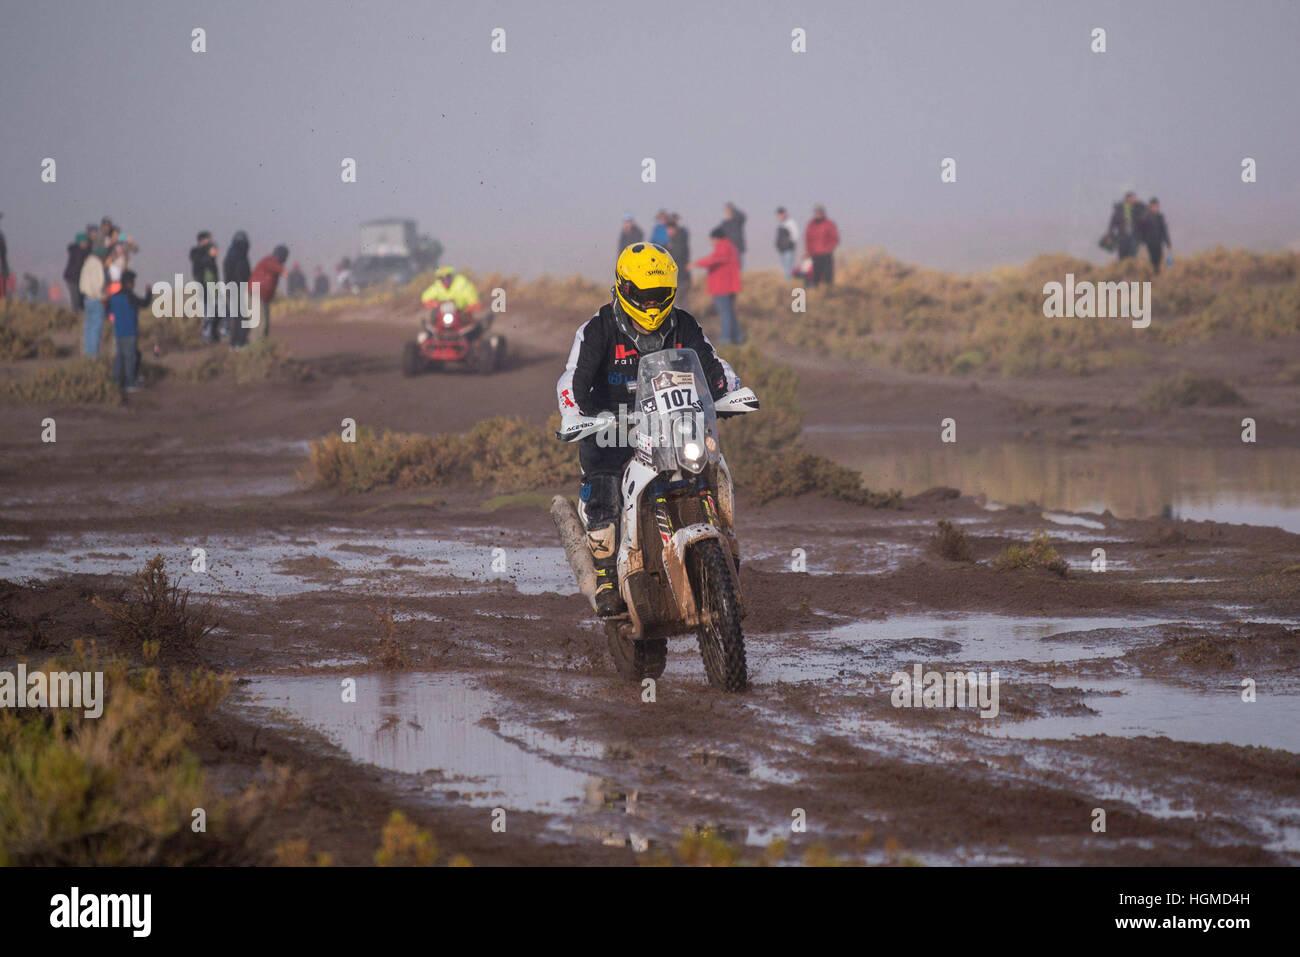 LA PAZ, LP - 10.01.2017: RALLY DAKAR 2017 - 107 Max Hunt (UK) the HUSQVARNA during the Dakar Rally 2017 on Tuesday - Stock Image